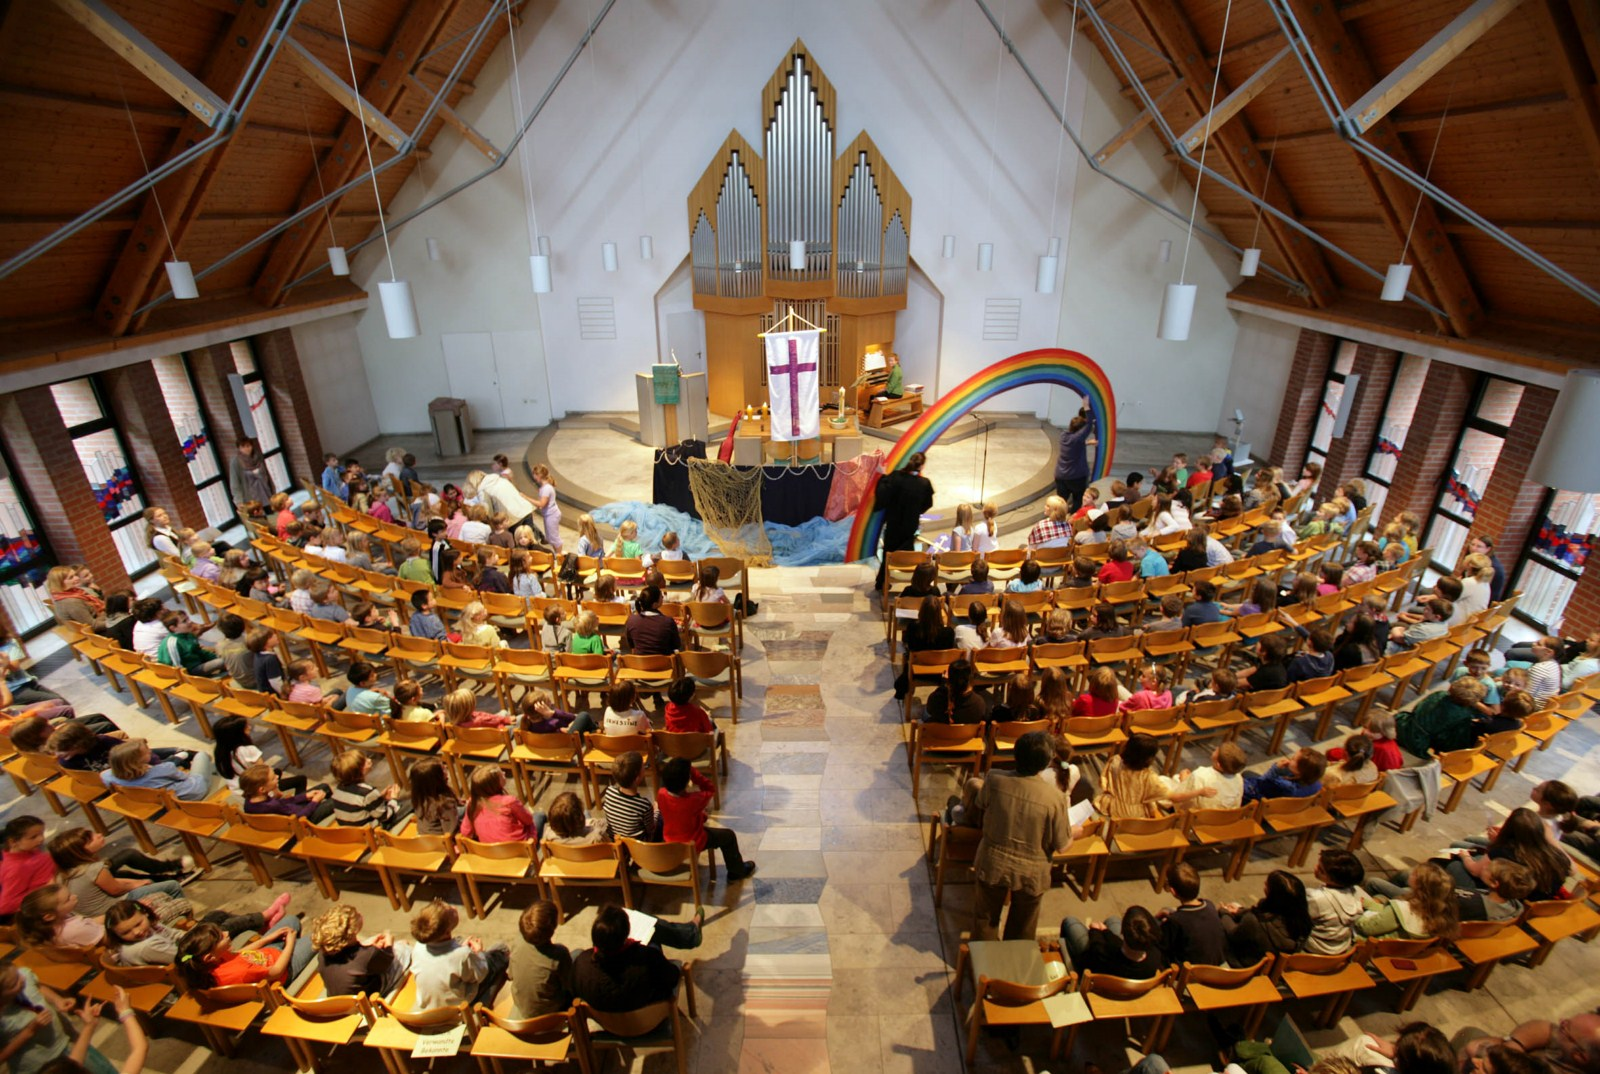 Innenraum Kirche, Gottesdienst